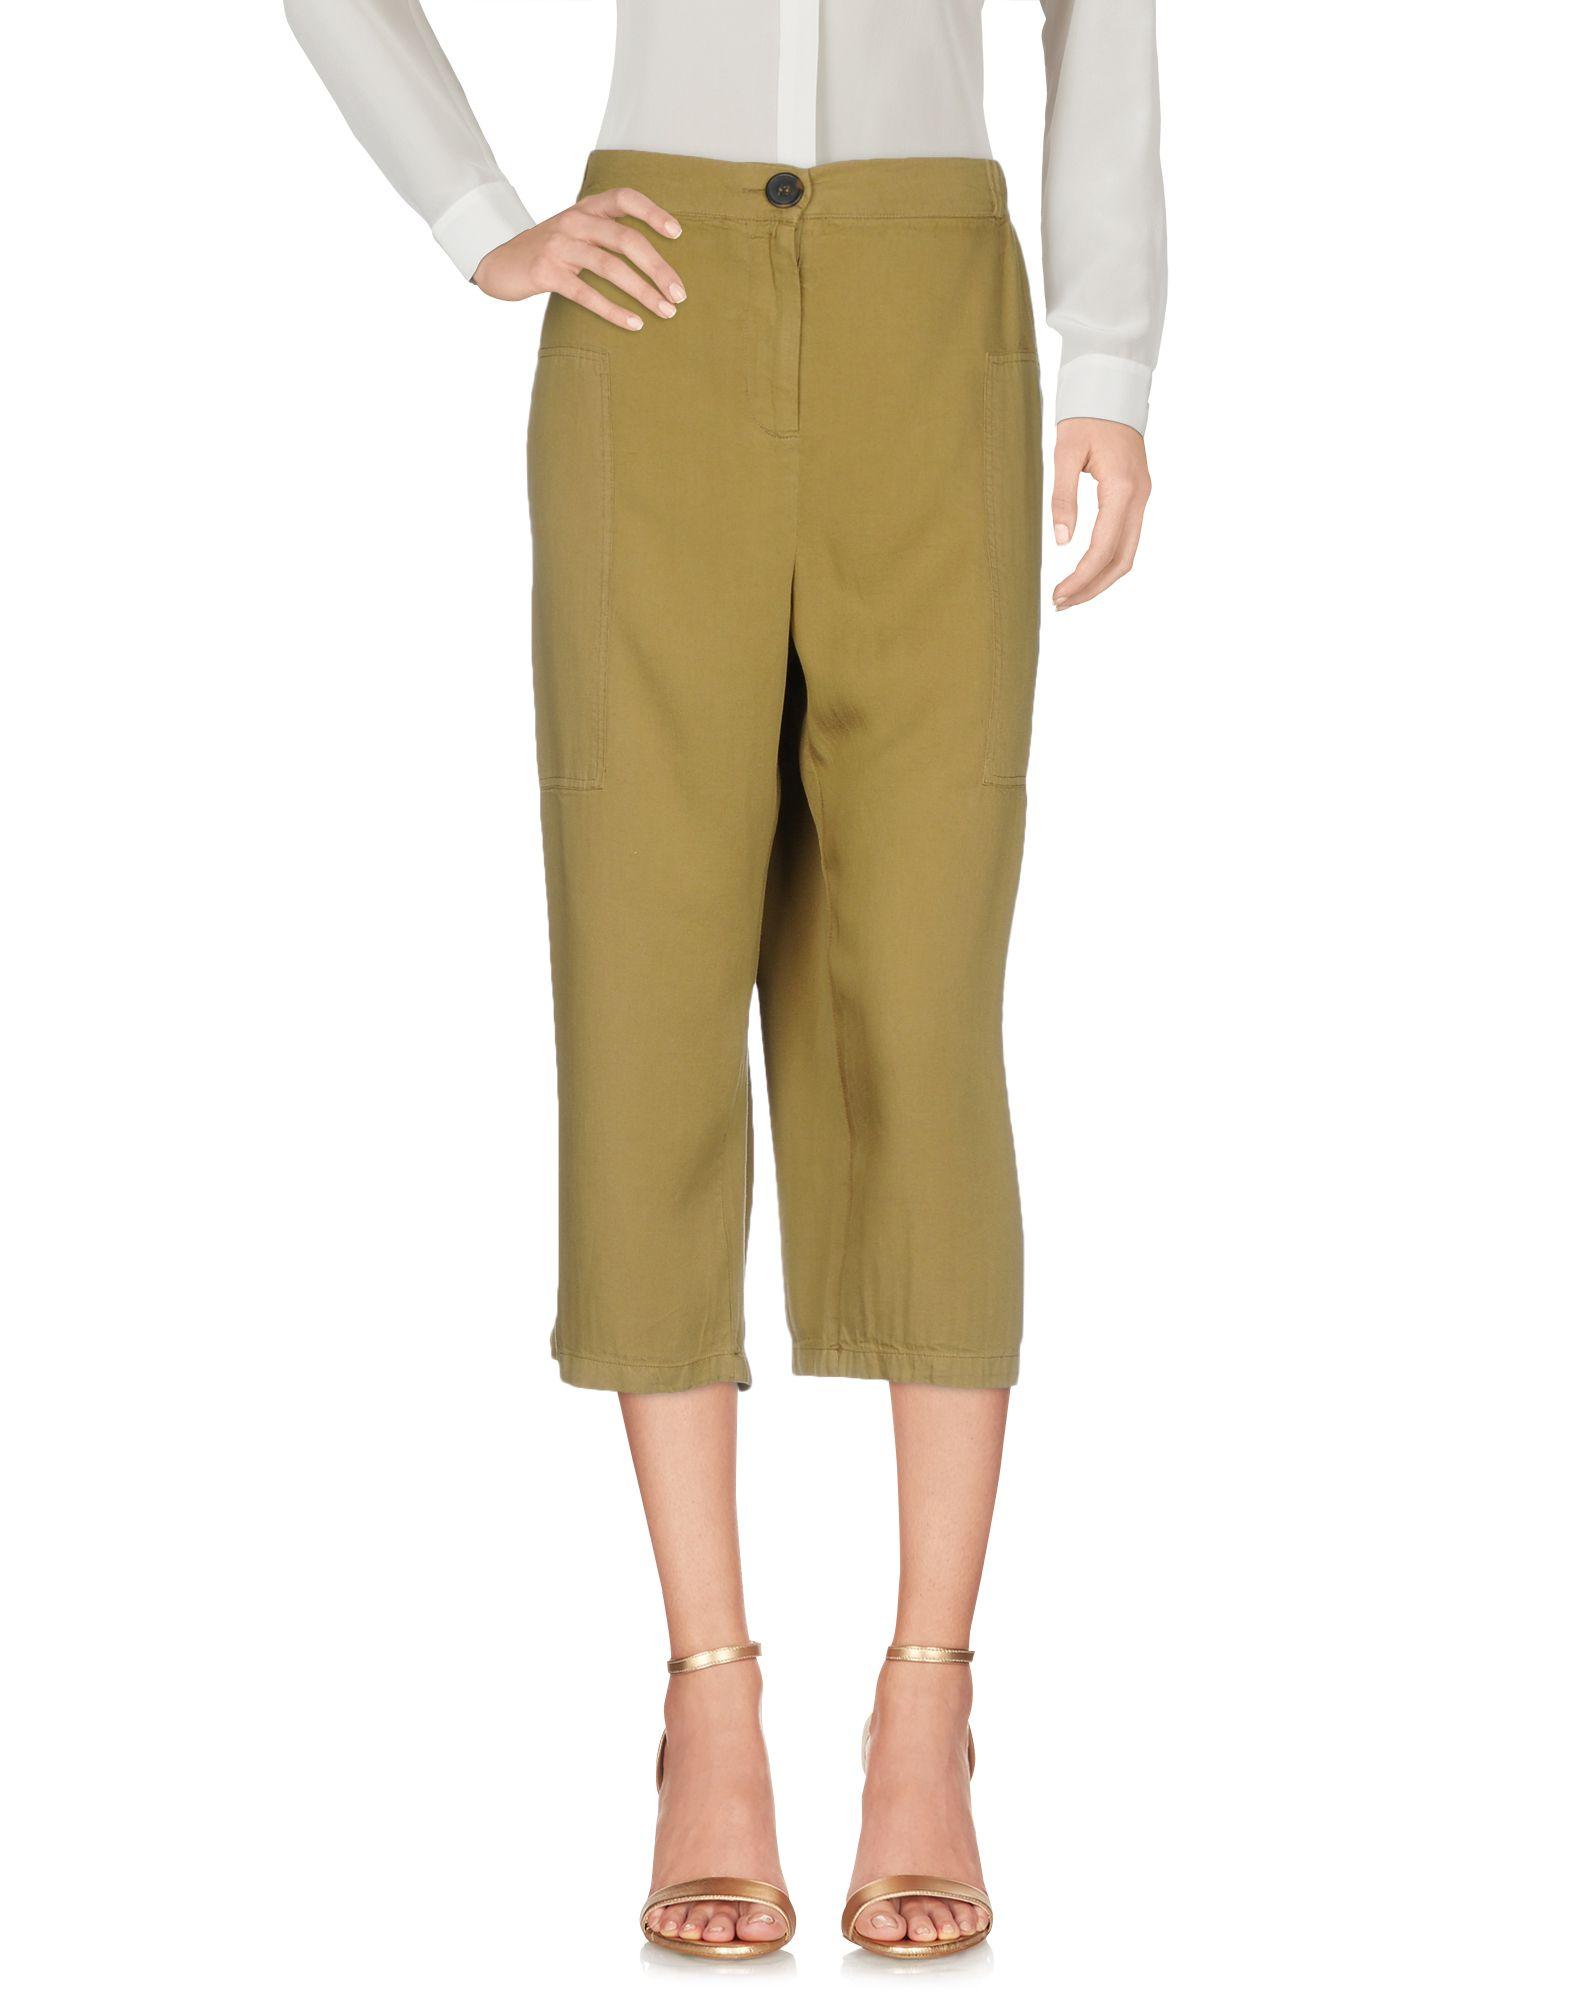 Pantalone Dritto Walter Baker Donna - Acquista online su 2NzjfDG